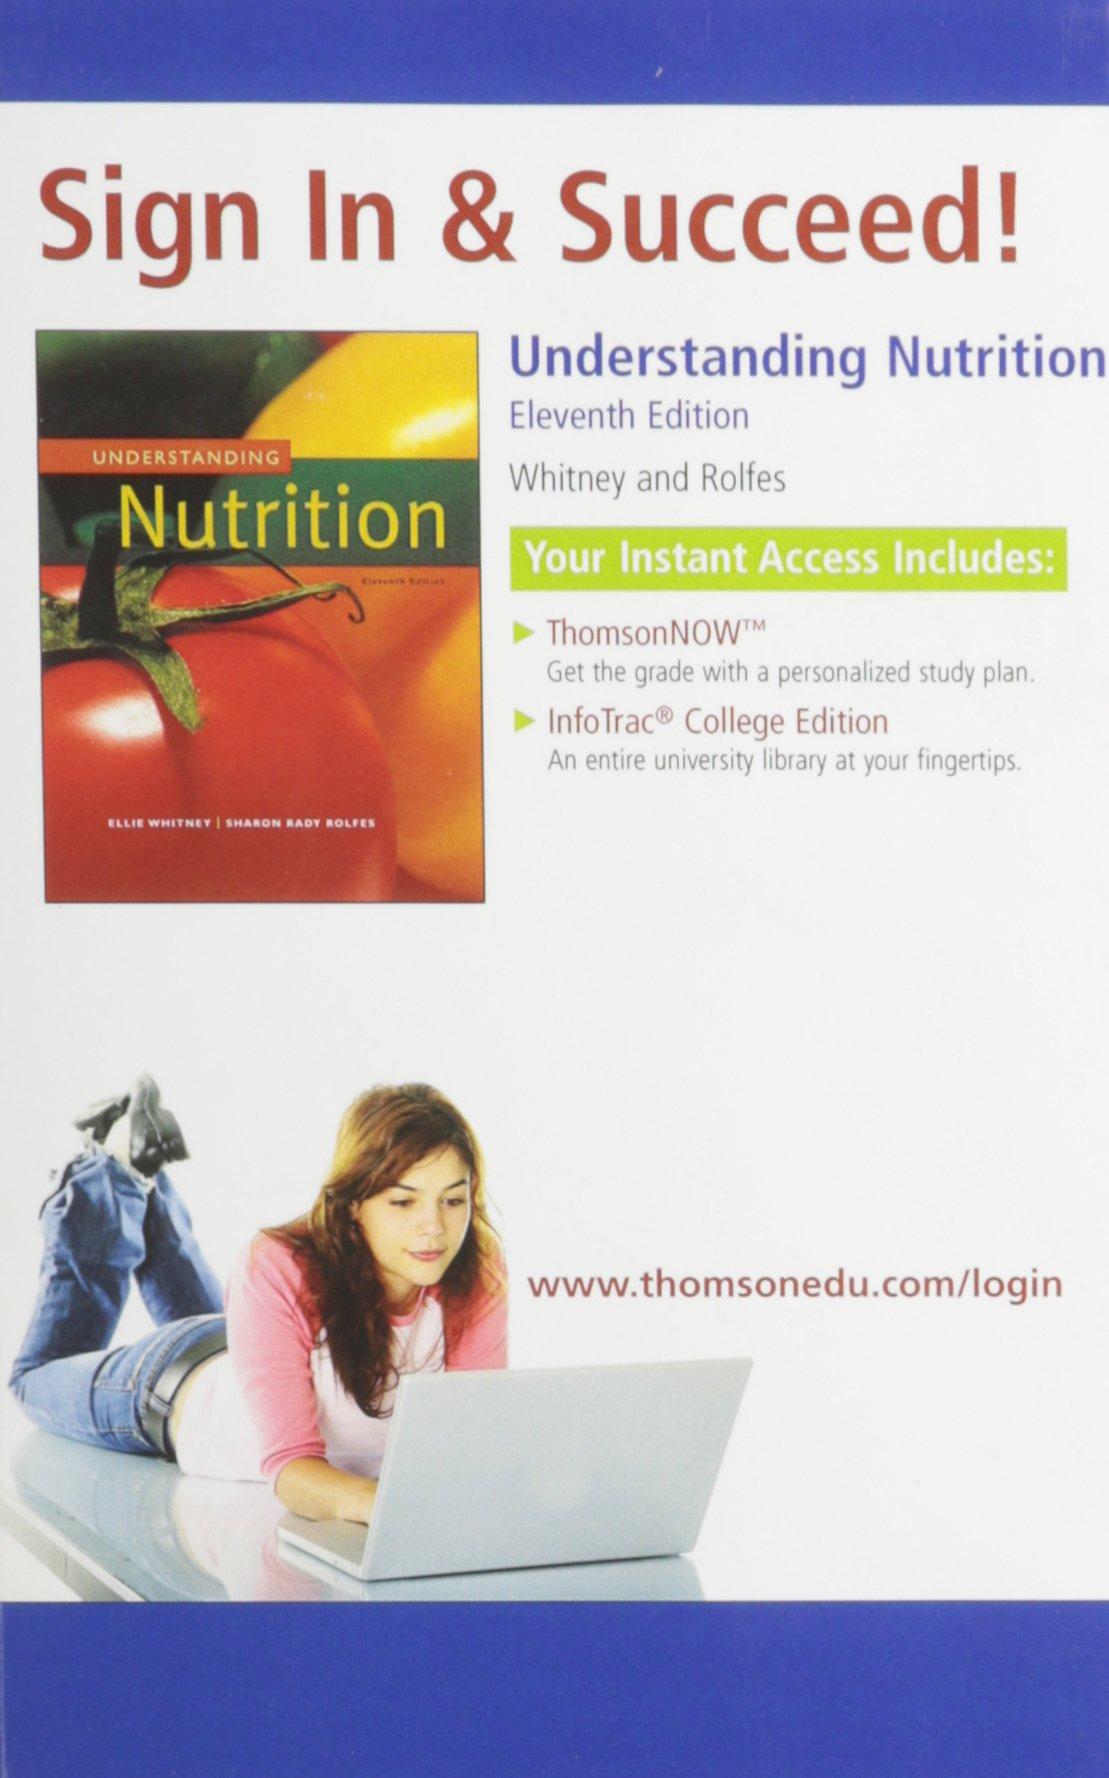 Understanding Nutrition: Eleanor Noss Whitney: 9780495116769: Amazon.com:  Books